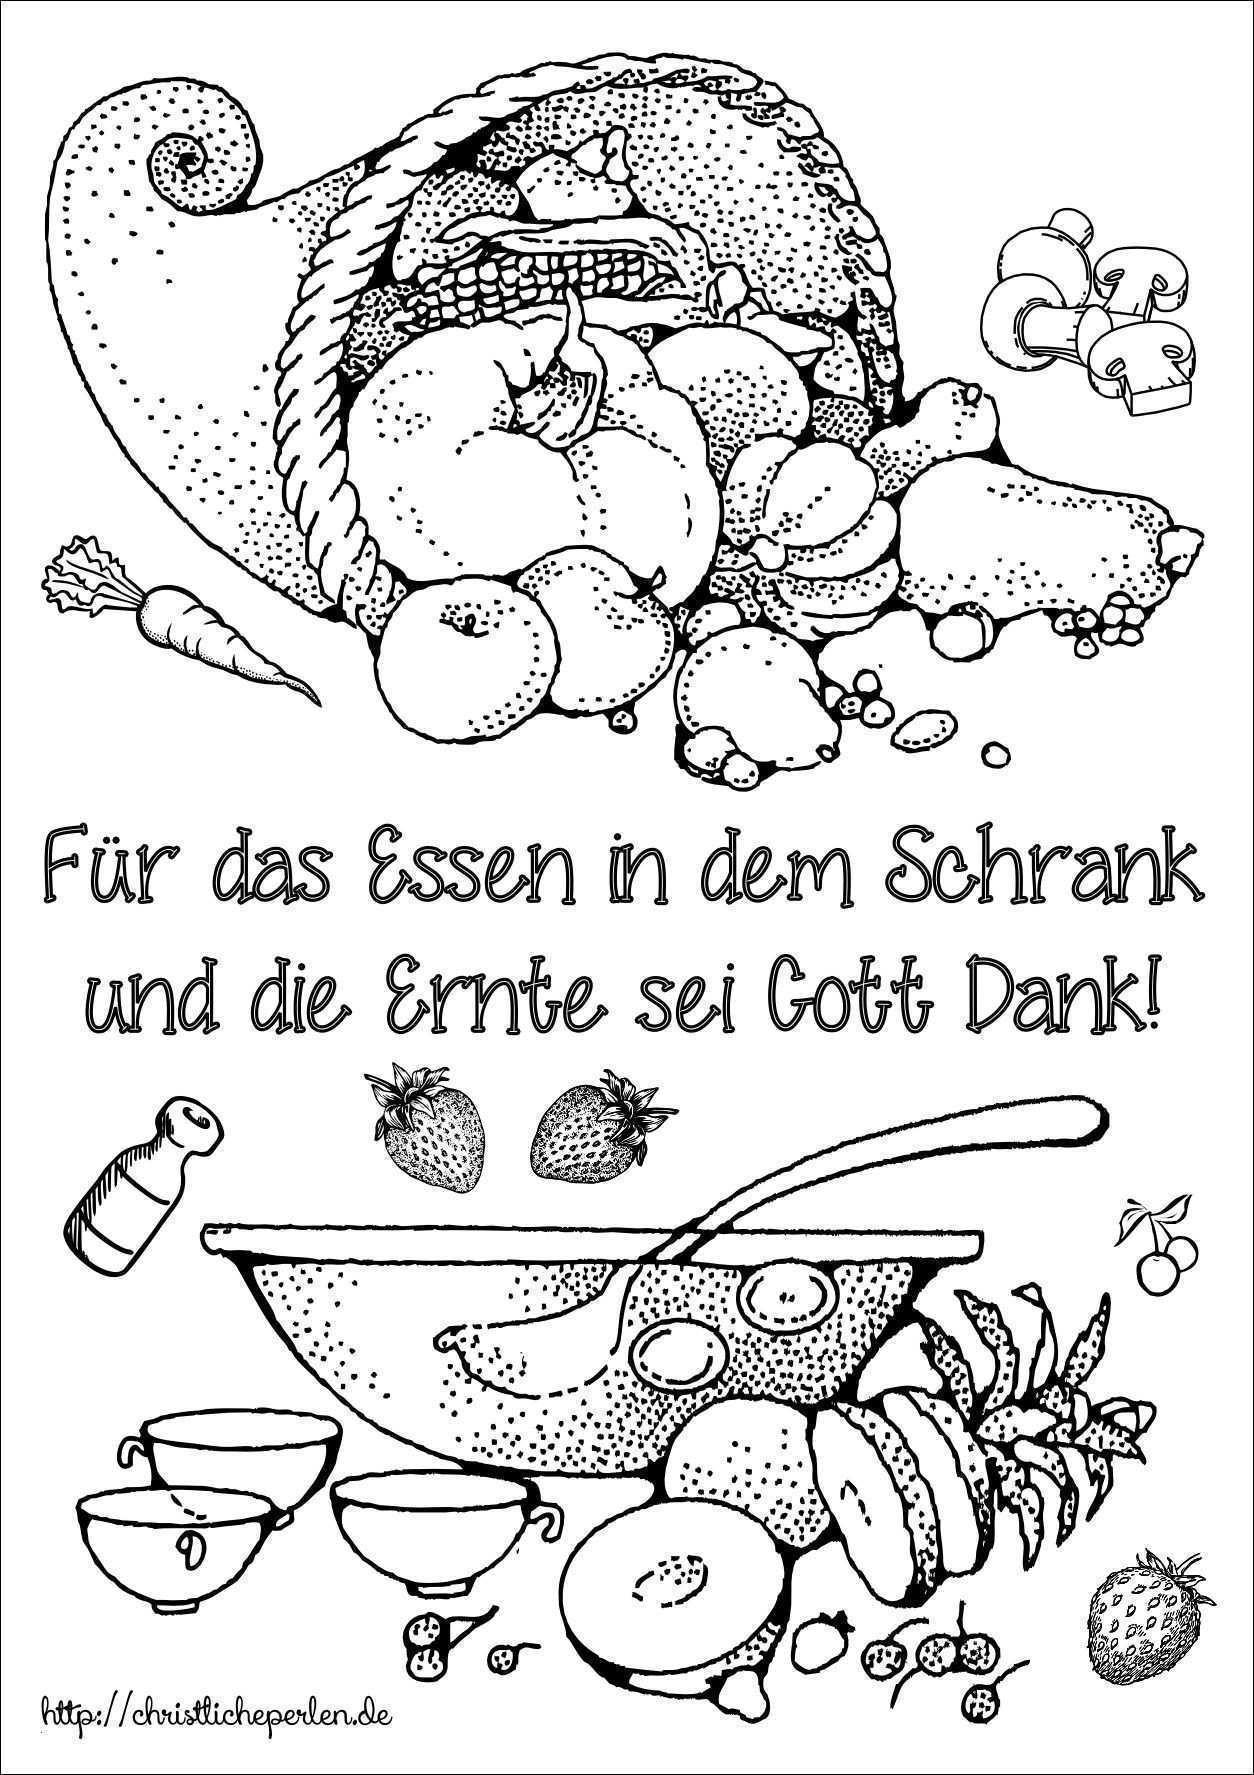 Sankt Martin Ausmalbilder Genial St Martin Ausmalbilder Fotos 40 Ausmalbilder Essen Scoredatscore Stock